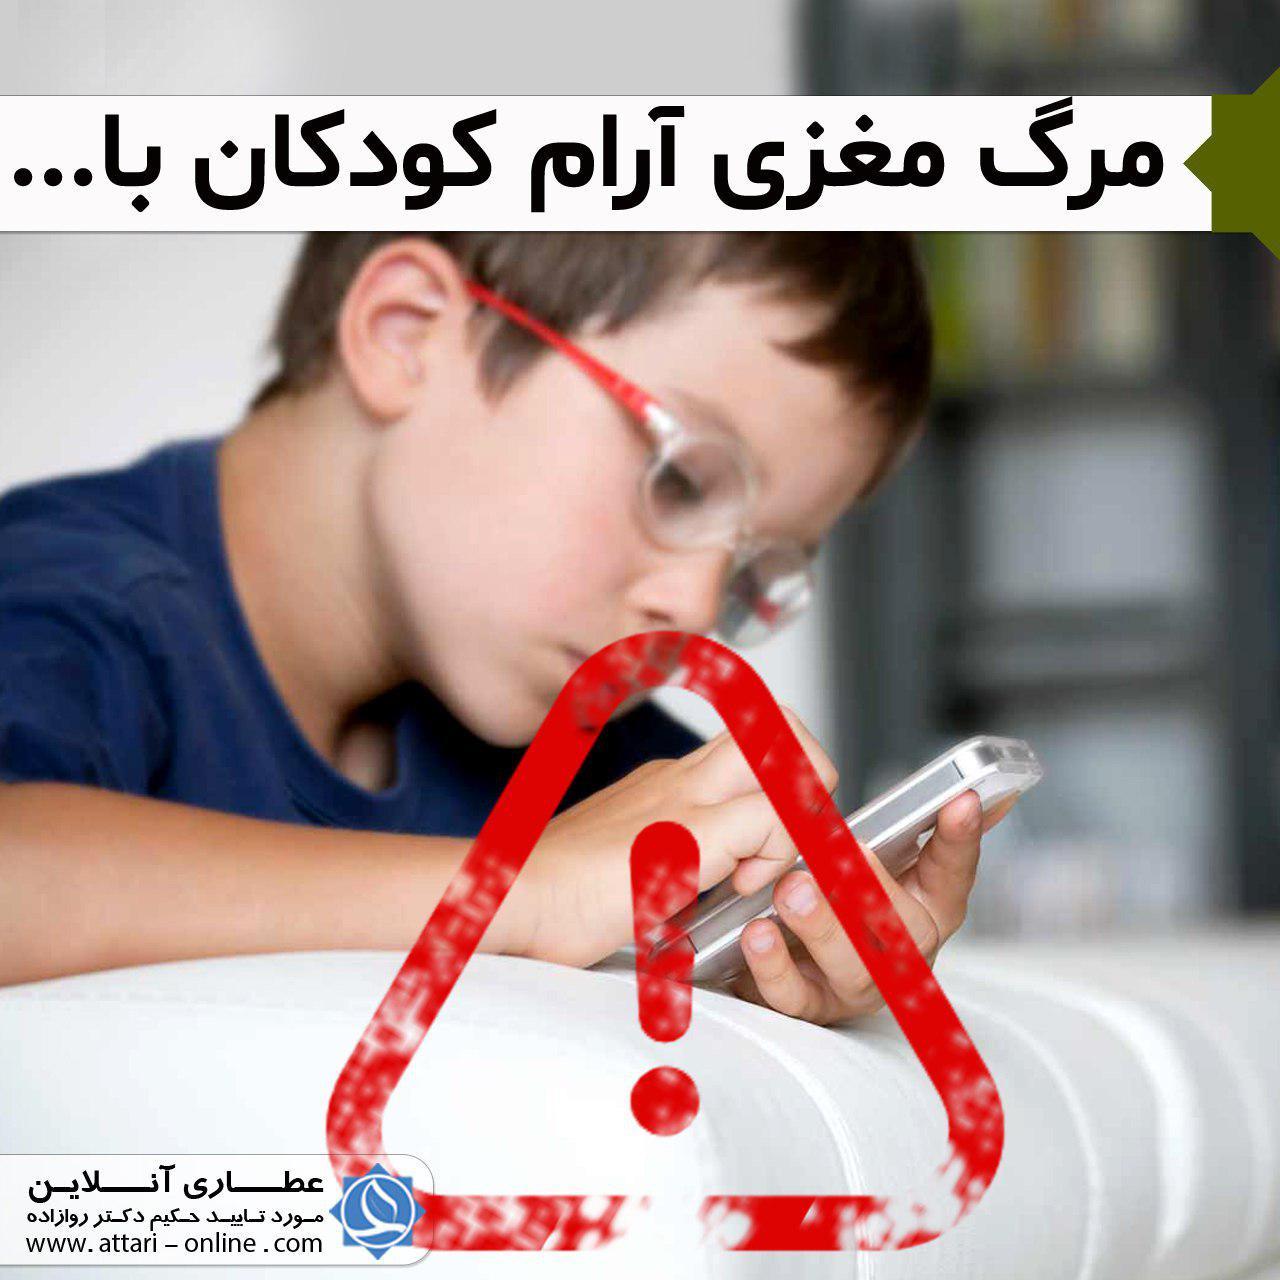 photo 2019 01 06 16 13 38 مرگ آرام مغزی کودکان با موبایل